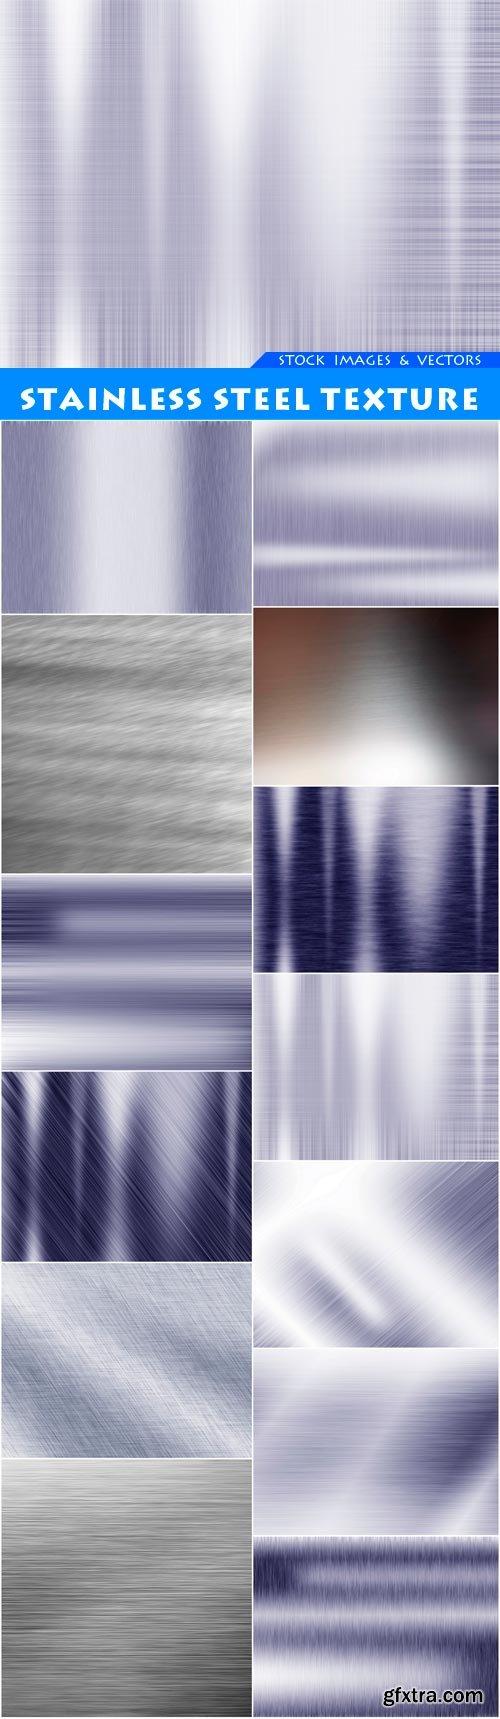 Stainless steel texture 13X JPEG